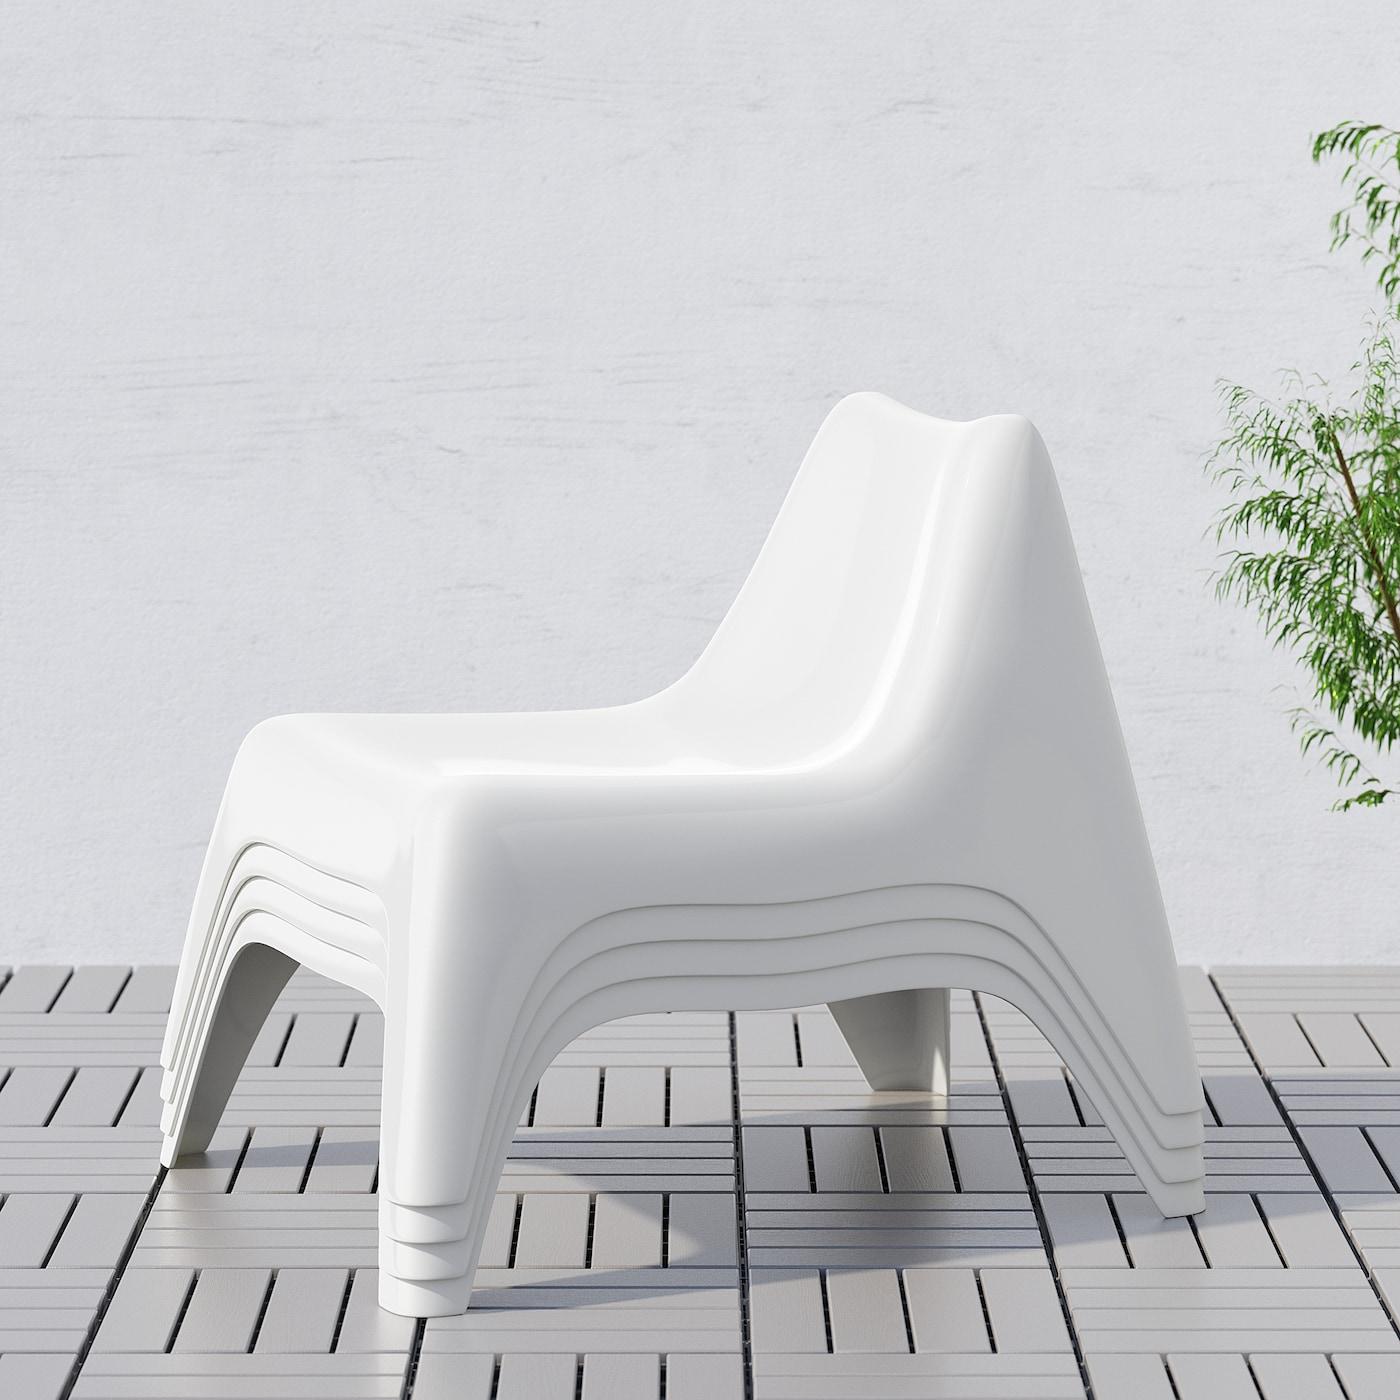 orange jardin tables salon table tables NEUF IKEA krokholmen Table basse//extérieur